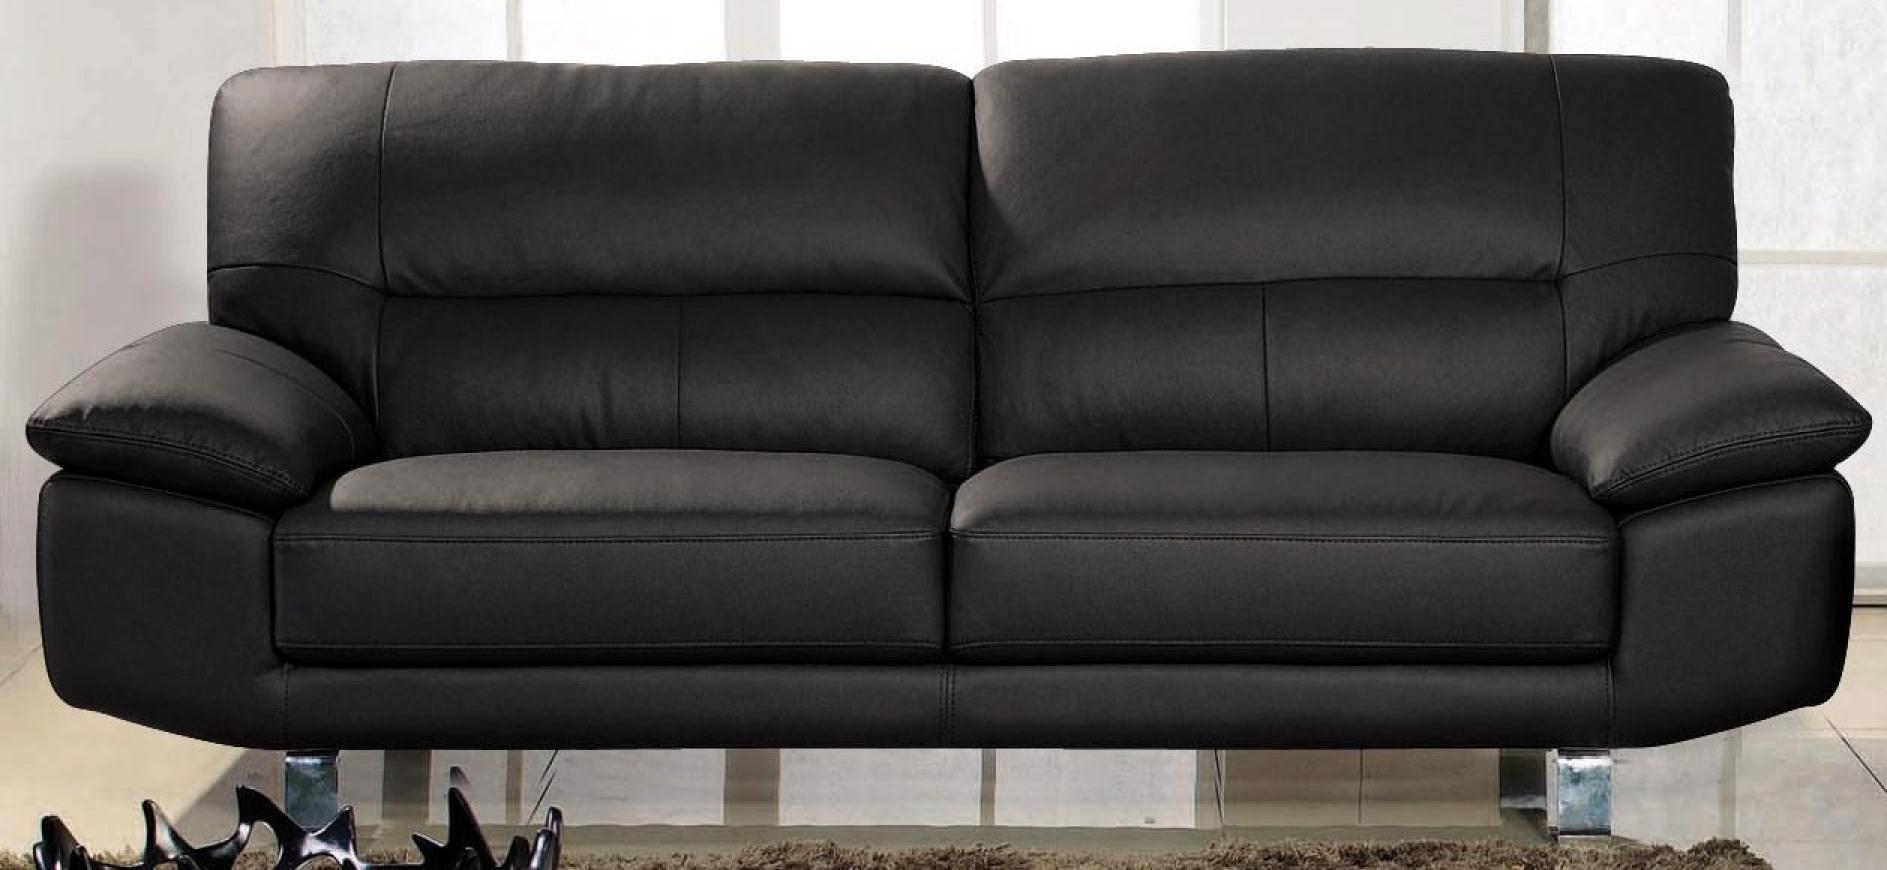 photos canap cuir 3 places. Black Bedroom Furniture Sets. Home Design Ideas